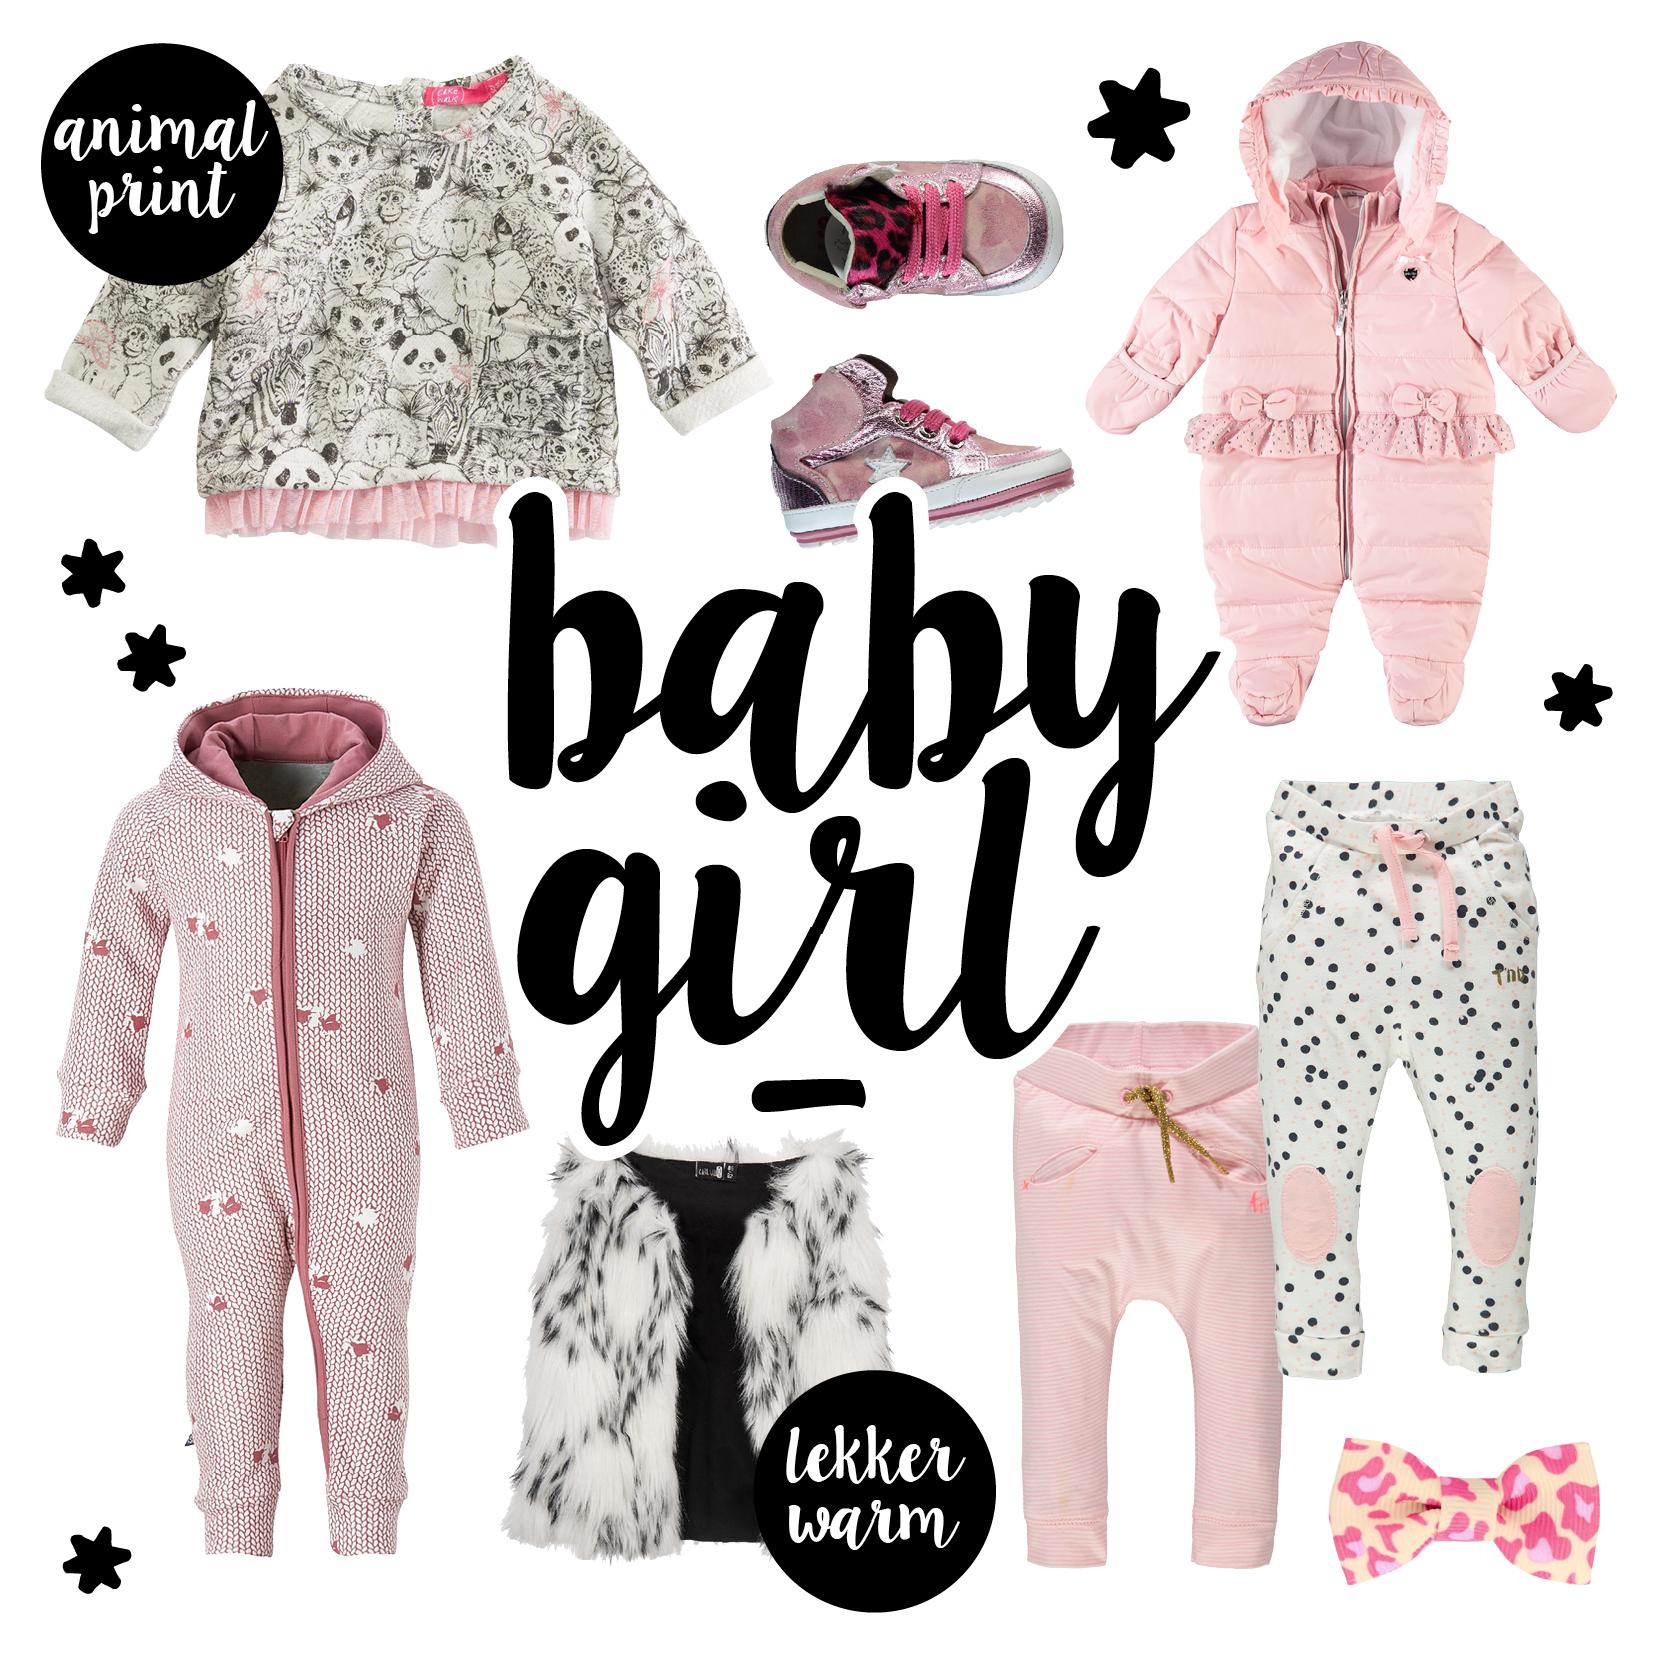 Najaar babykleding, baby meisjes kleding, babymode winter 2016-2017